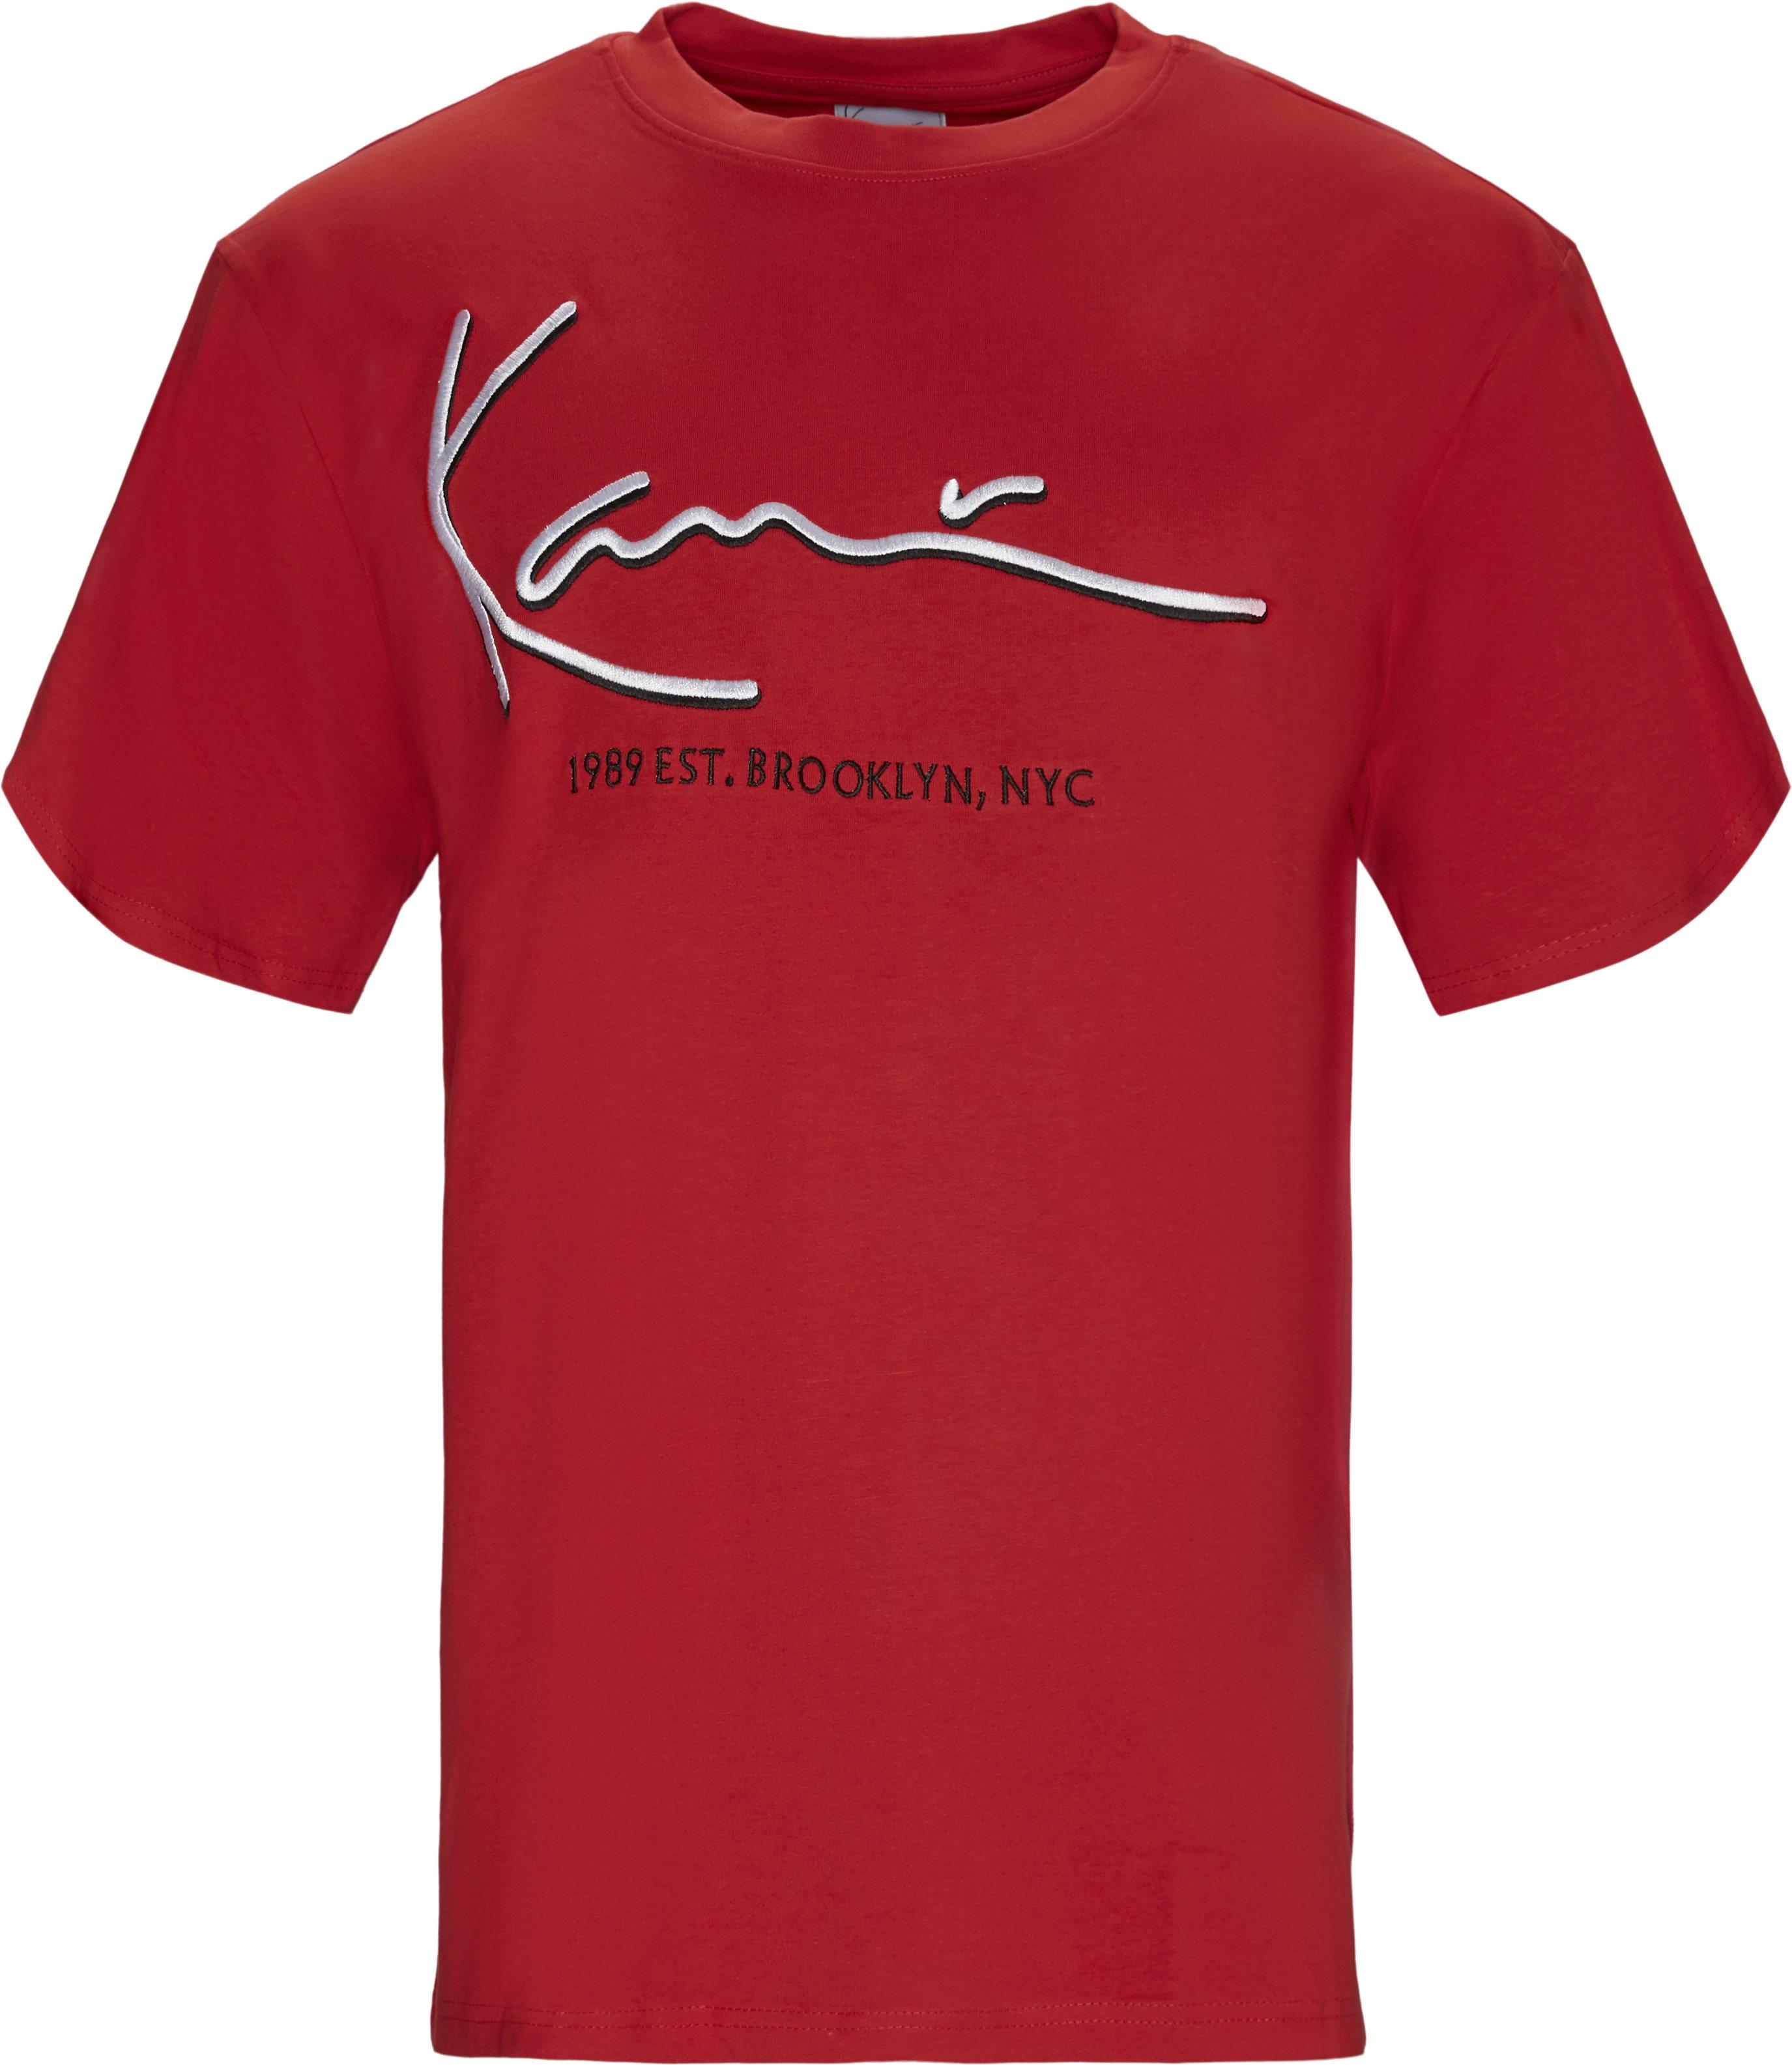 Signature Tee - T-shirts - Regular - Rød